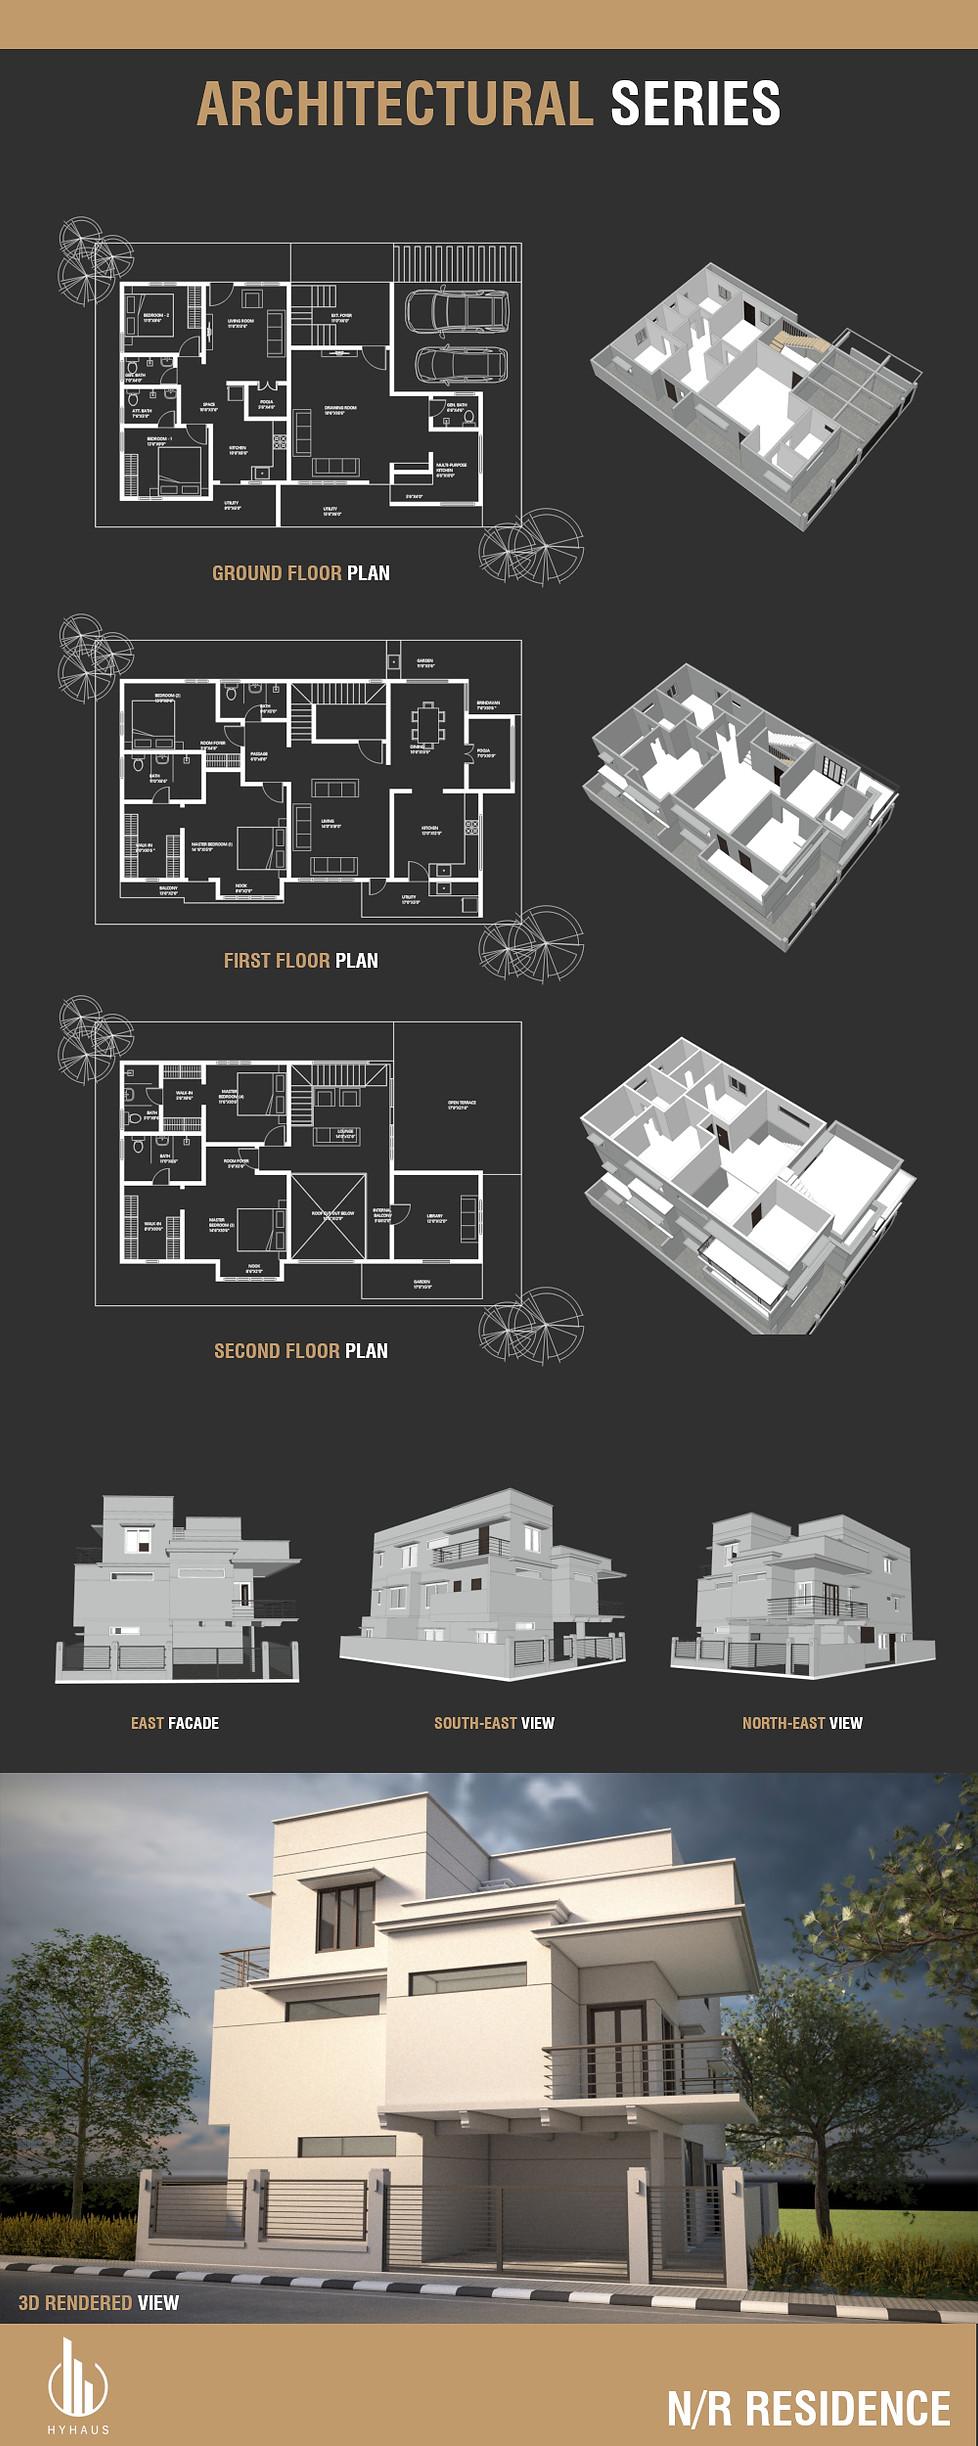 architectual series.JPG